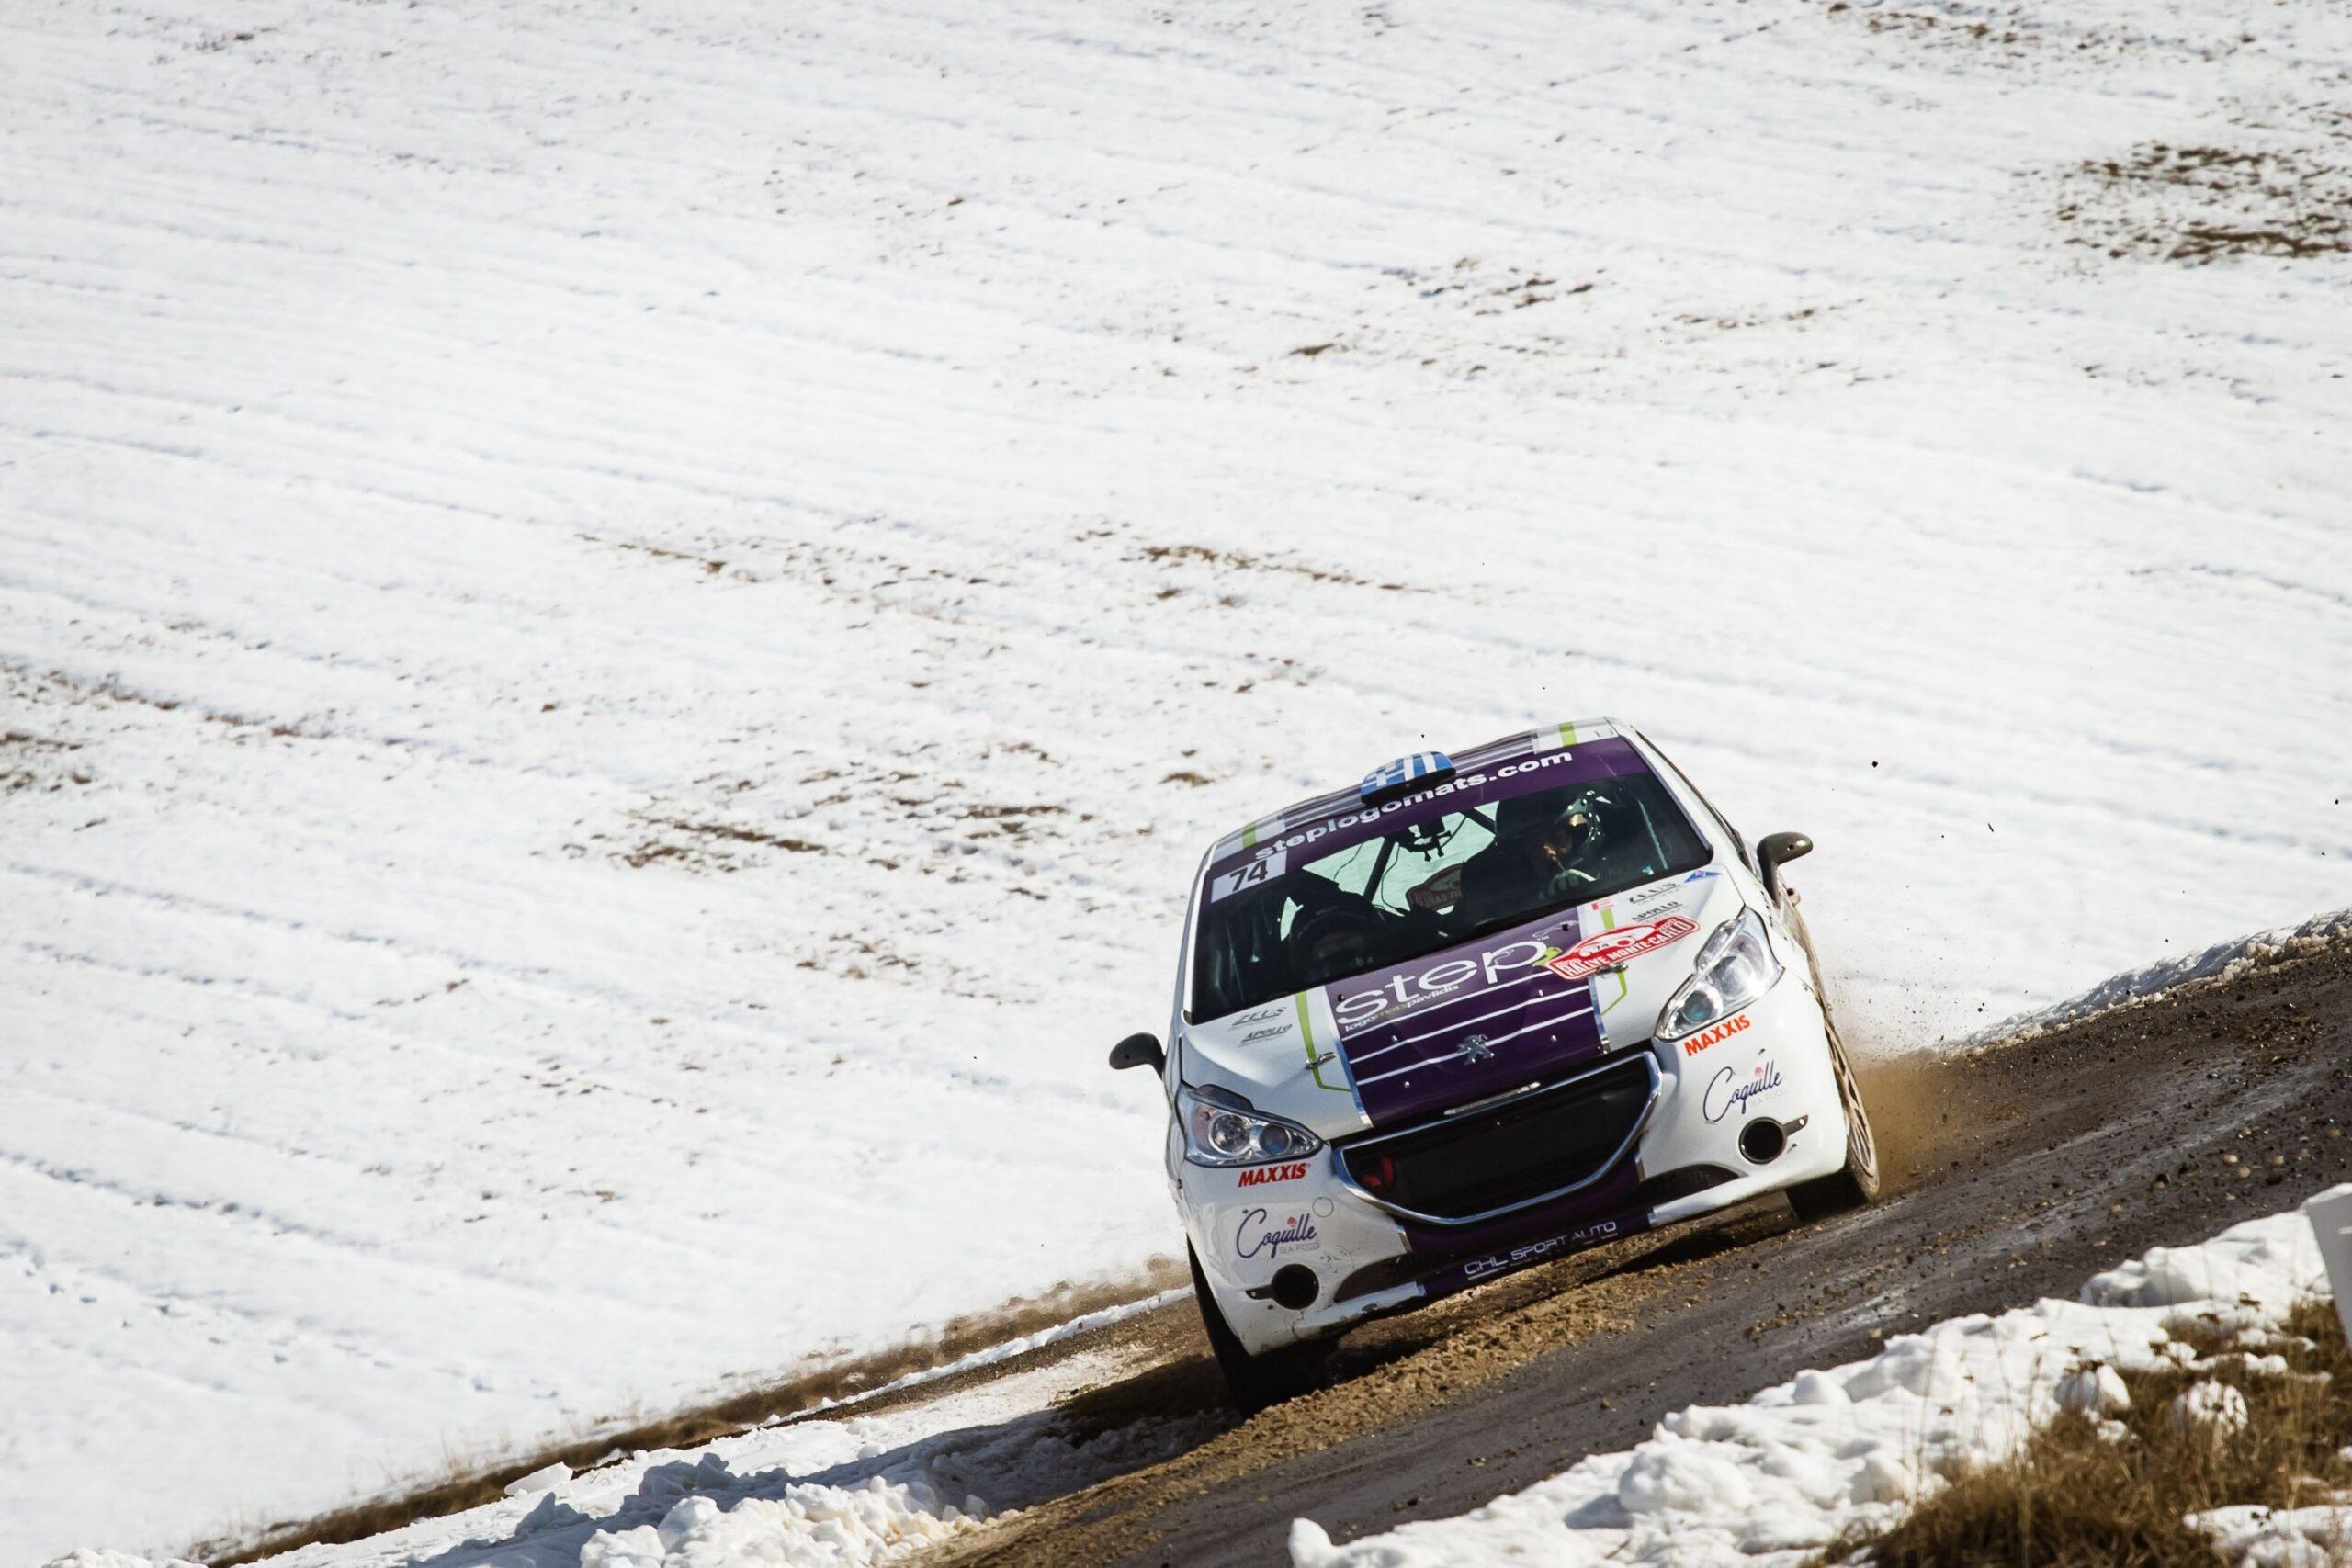 Step Racing- Rallye Monte Carlo – preview: Ακόμη μια περιπέτεια αρχίζει για τους Νίκο Παυλίδη-Allan Harryman!